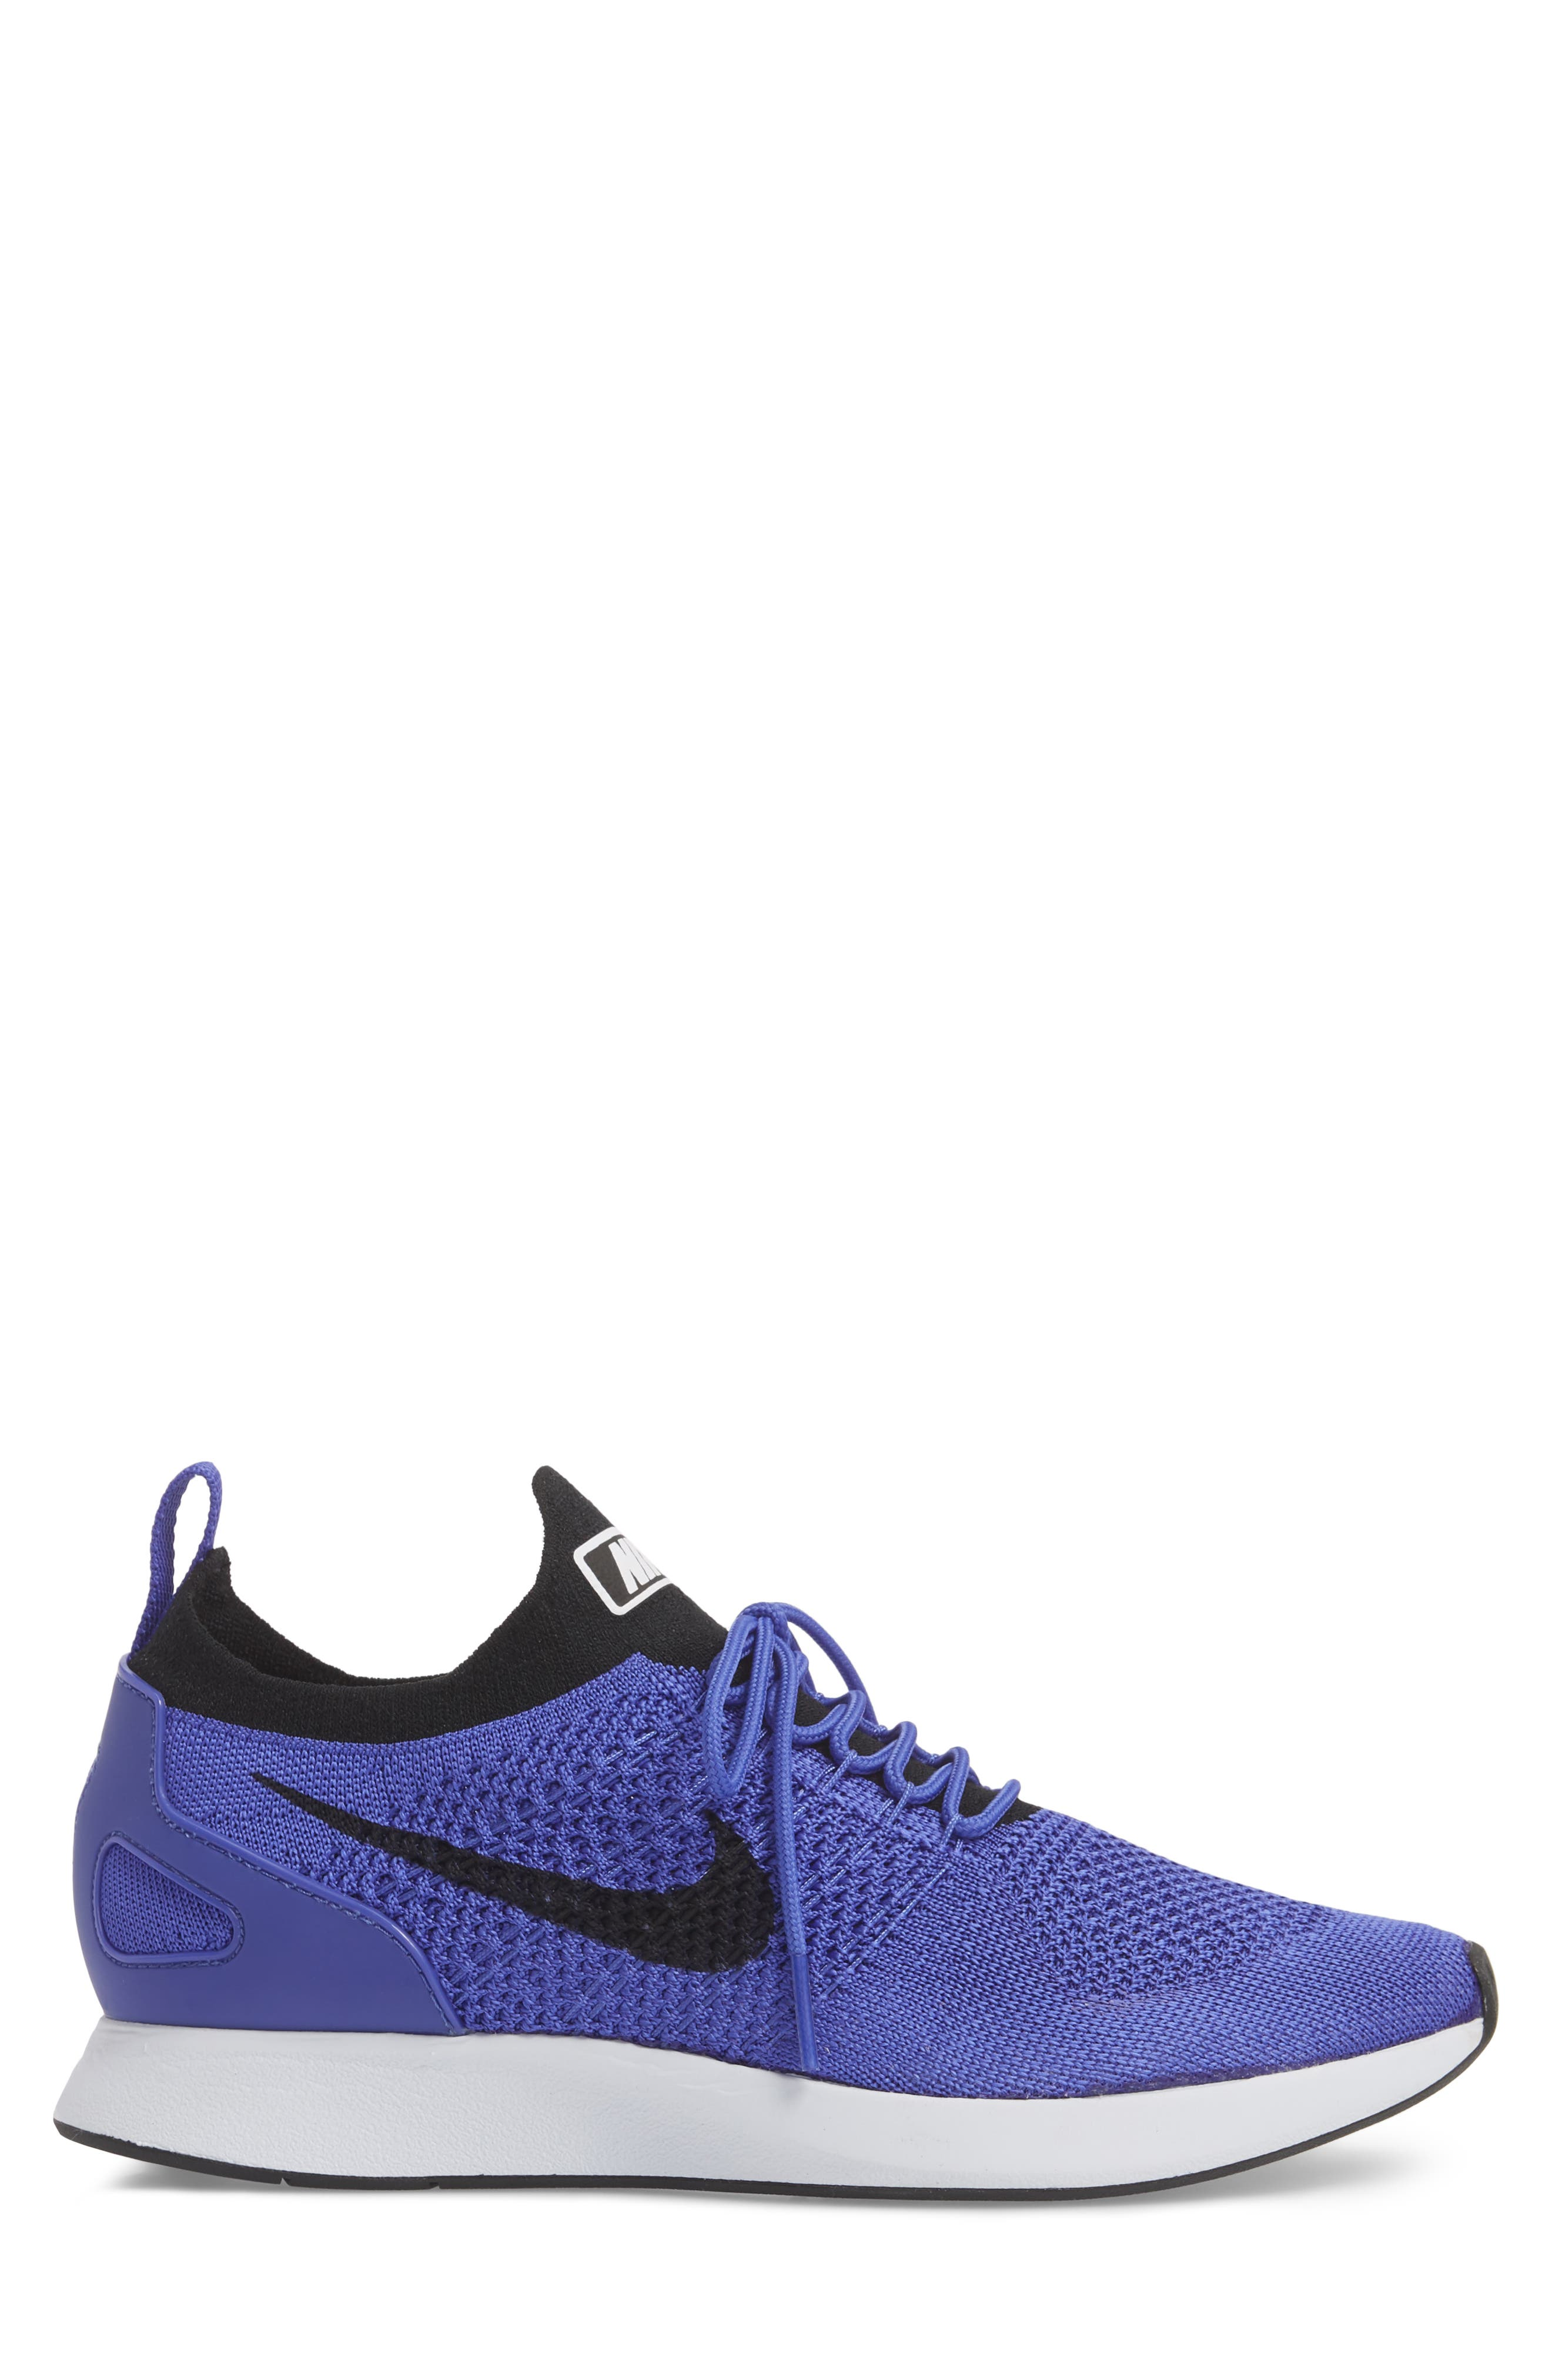 Air Zoom Mariah Flyknit Racer Sneaker,                             Alternate thumbnail 3, color,                             VIOLET/ BLACK/ WHITE